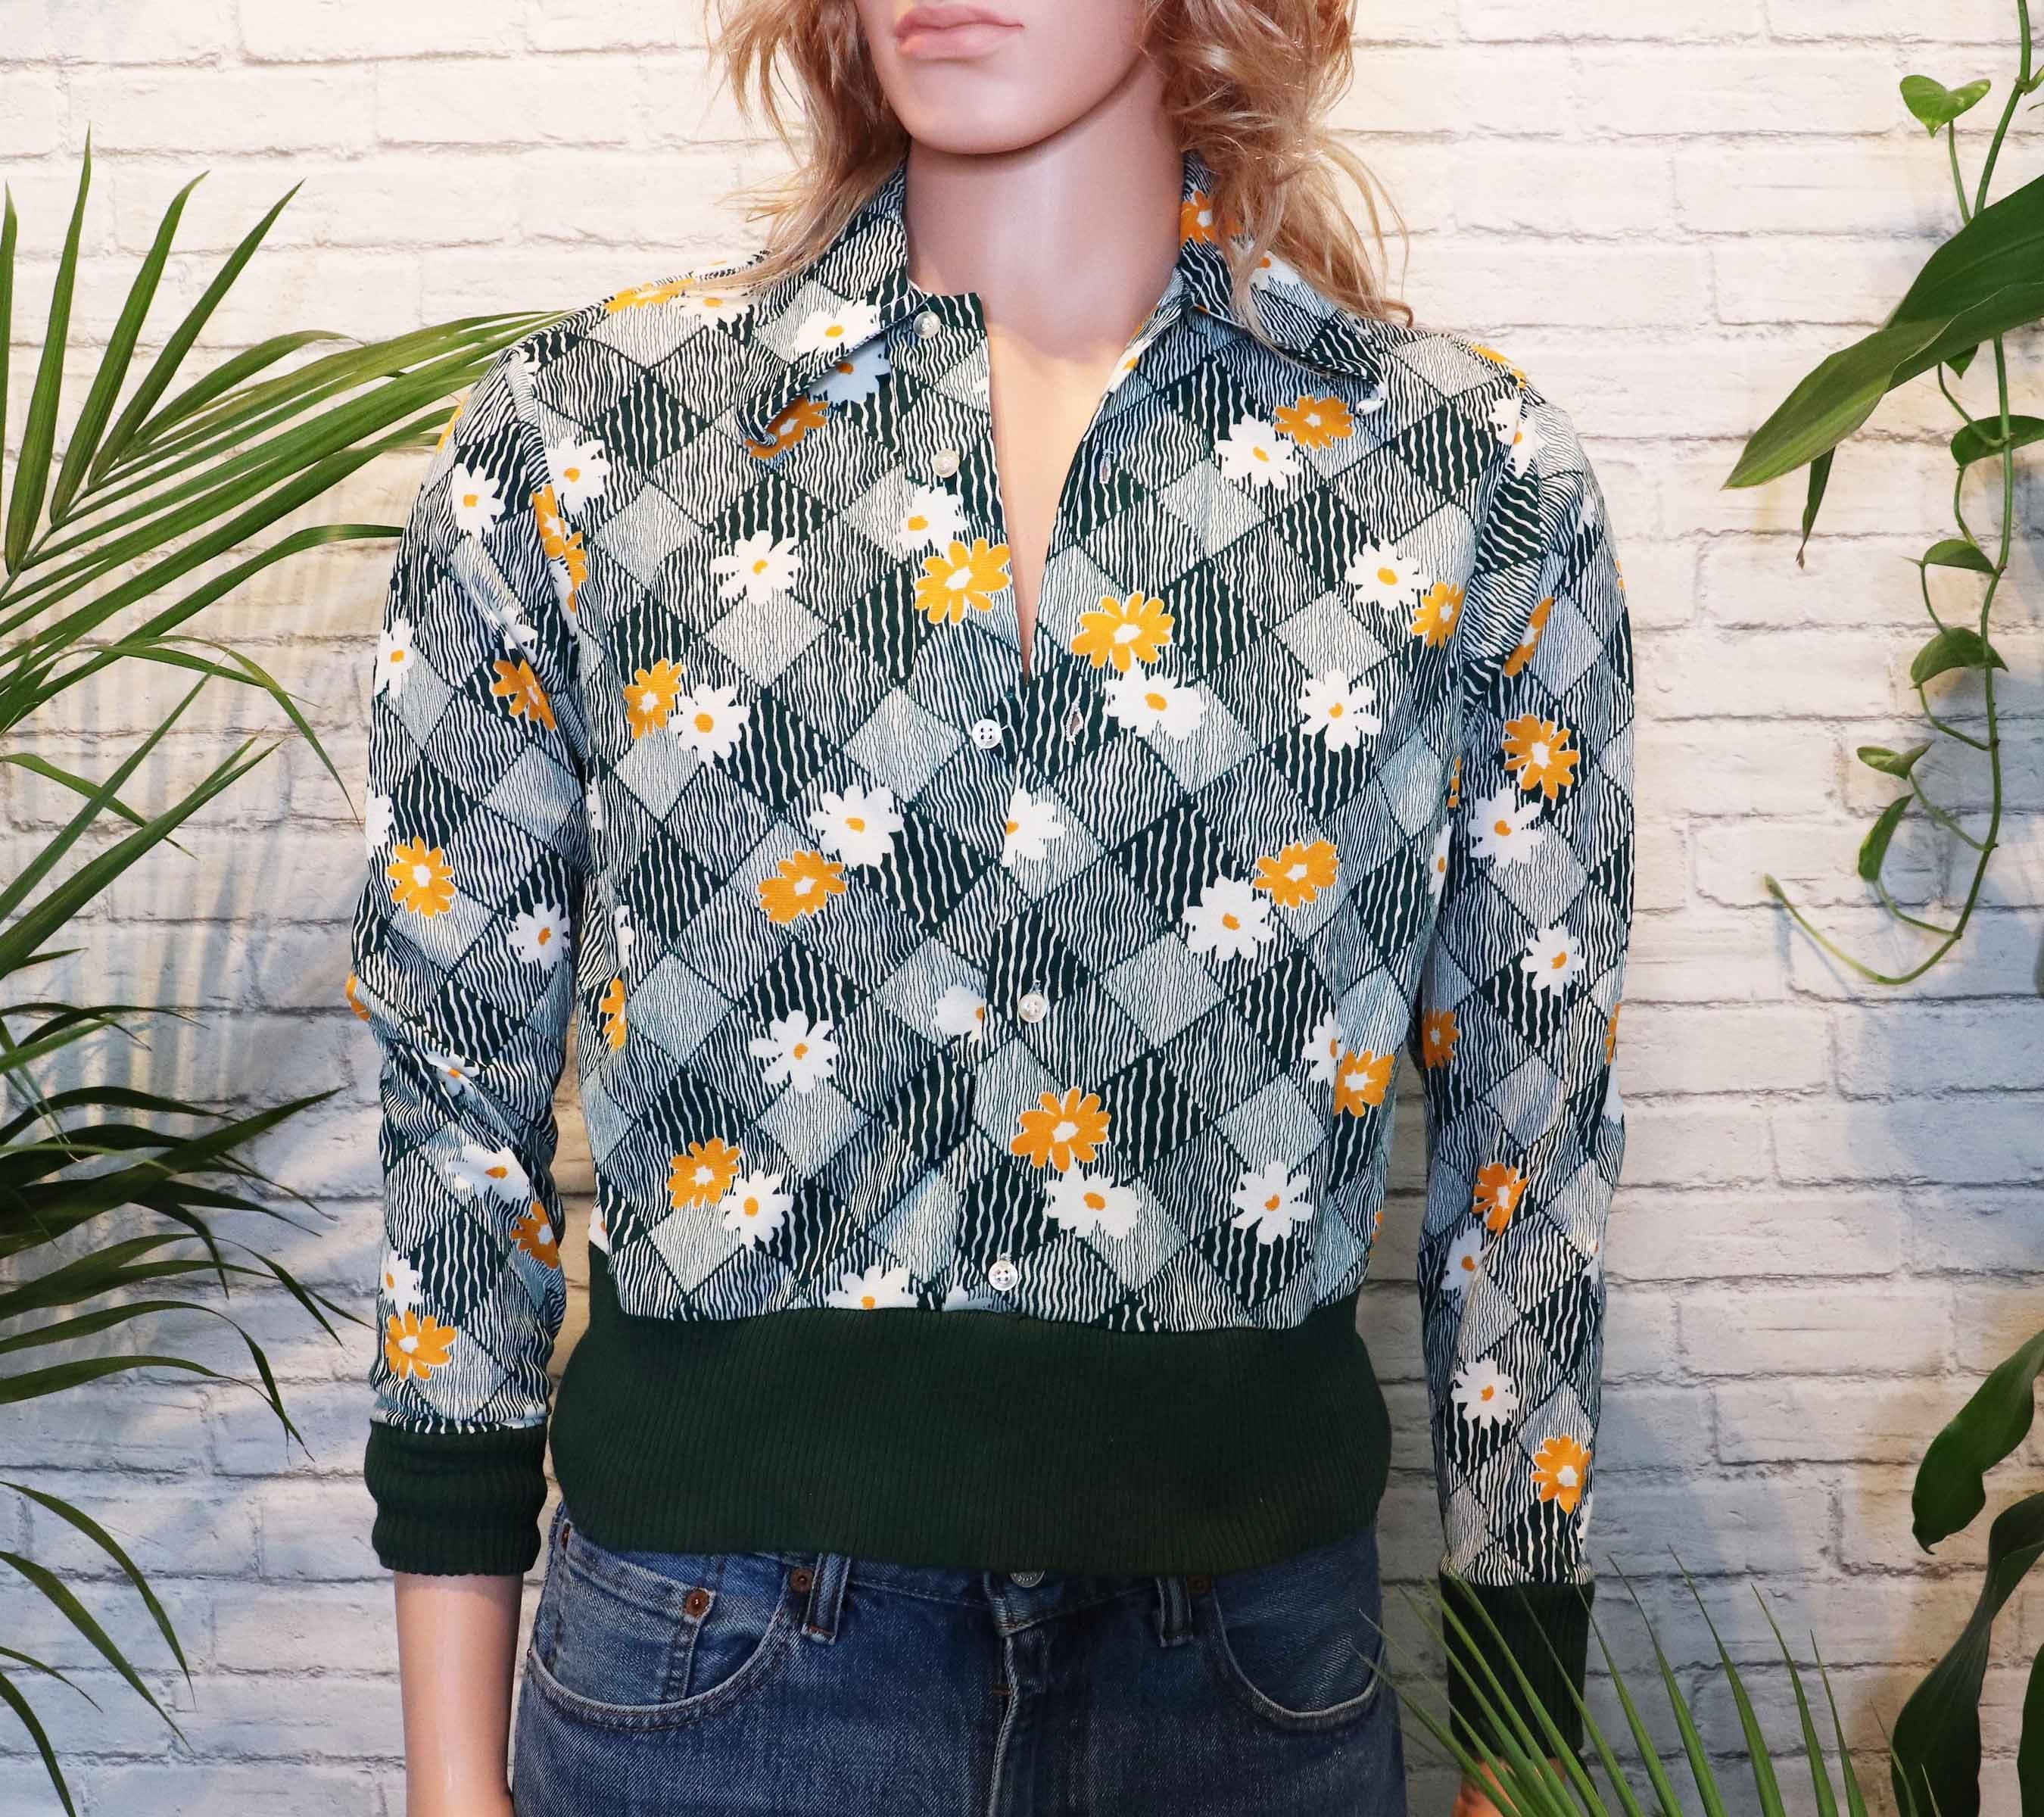 1960s – 70s Men's Ties | Skinny Ties, Slim Ties 1960S Hippie Gaucho Shirt  Rare Gaucho Originals Pullover Long Sleeve Polo Deadstock Unworn Ribbed Knit Disco Funk $19.55 AT vintagedancer.com